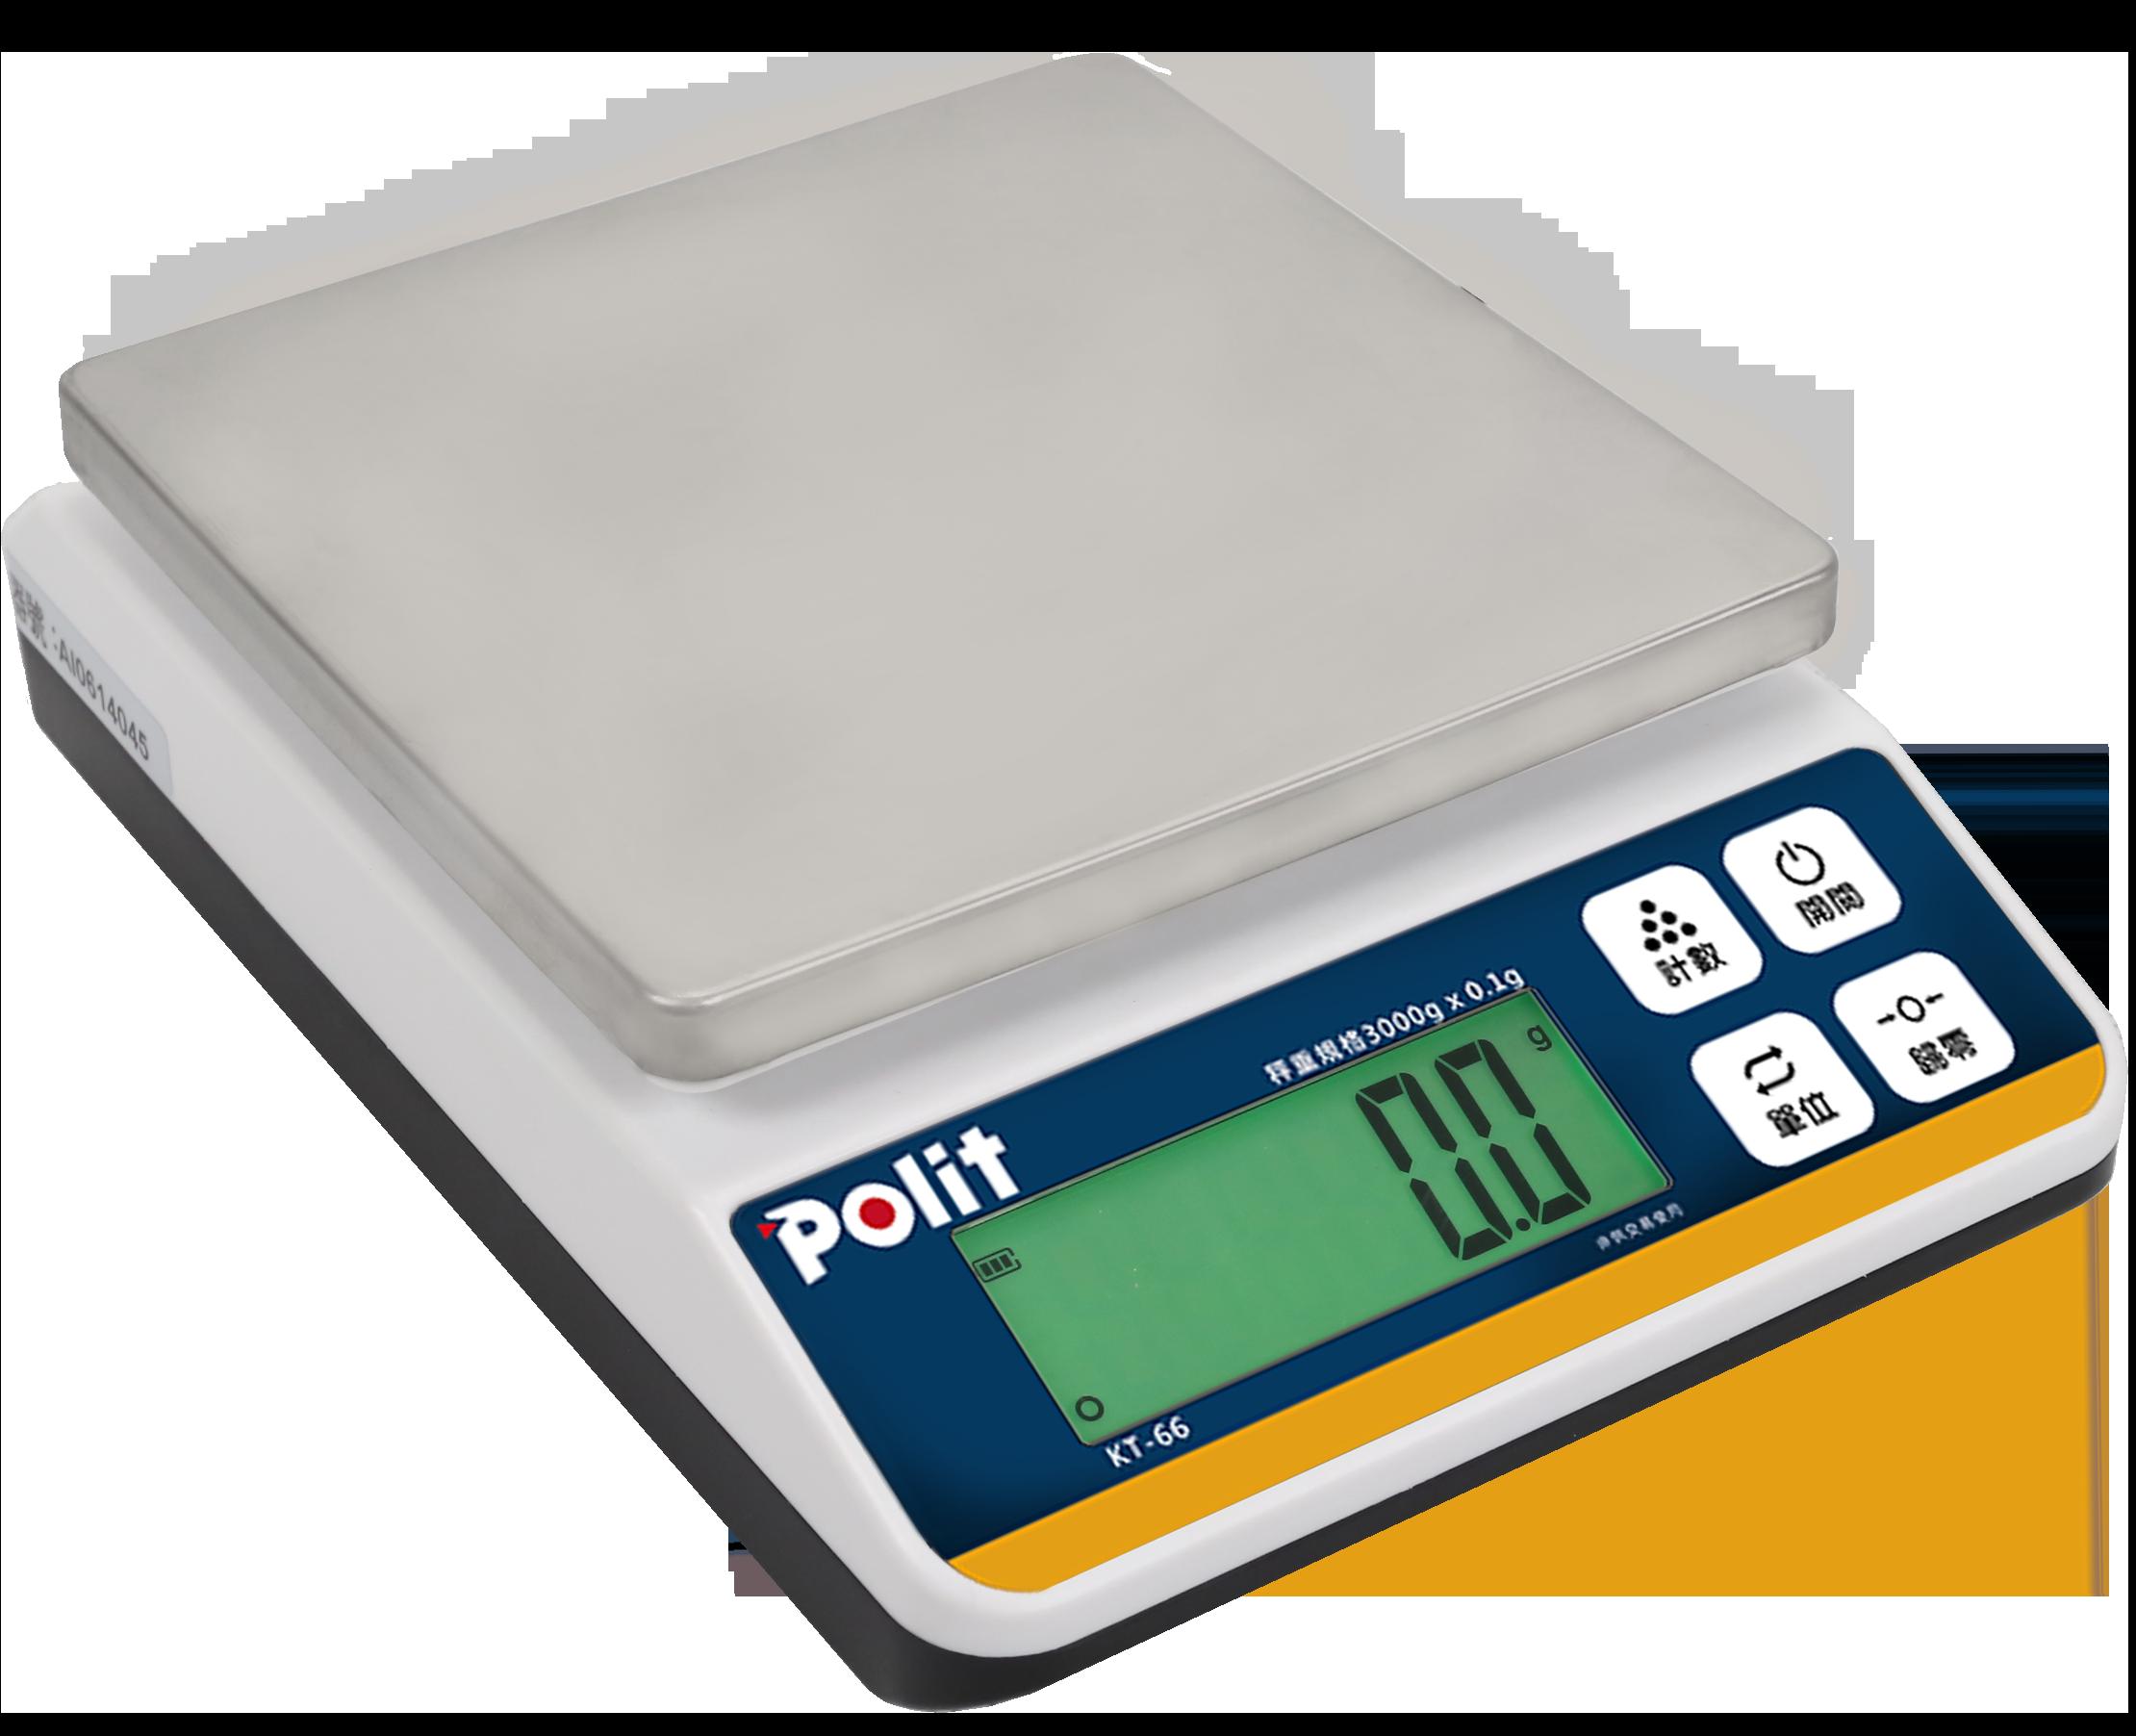 KT-66數位電子秤 | 沛禮國際 Polit 電子秤專賣